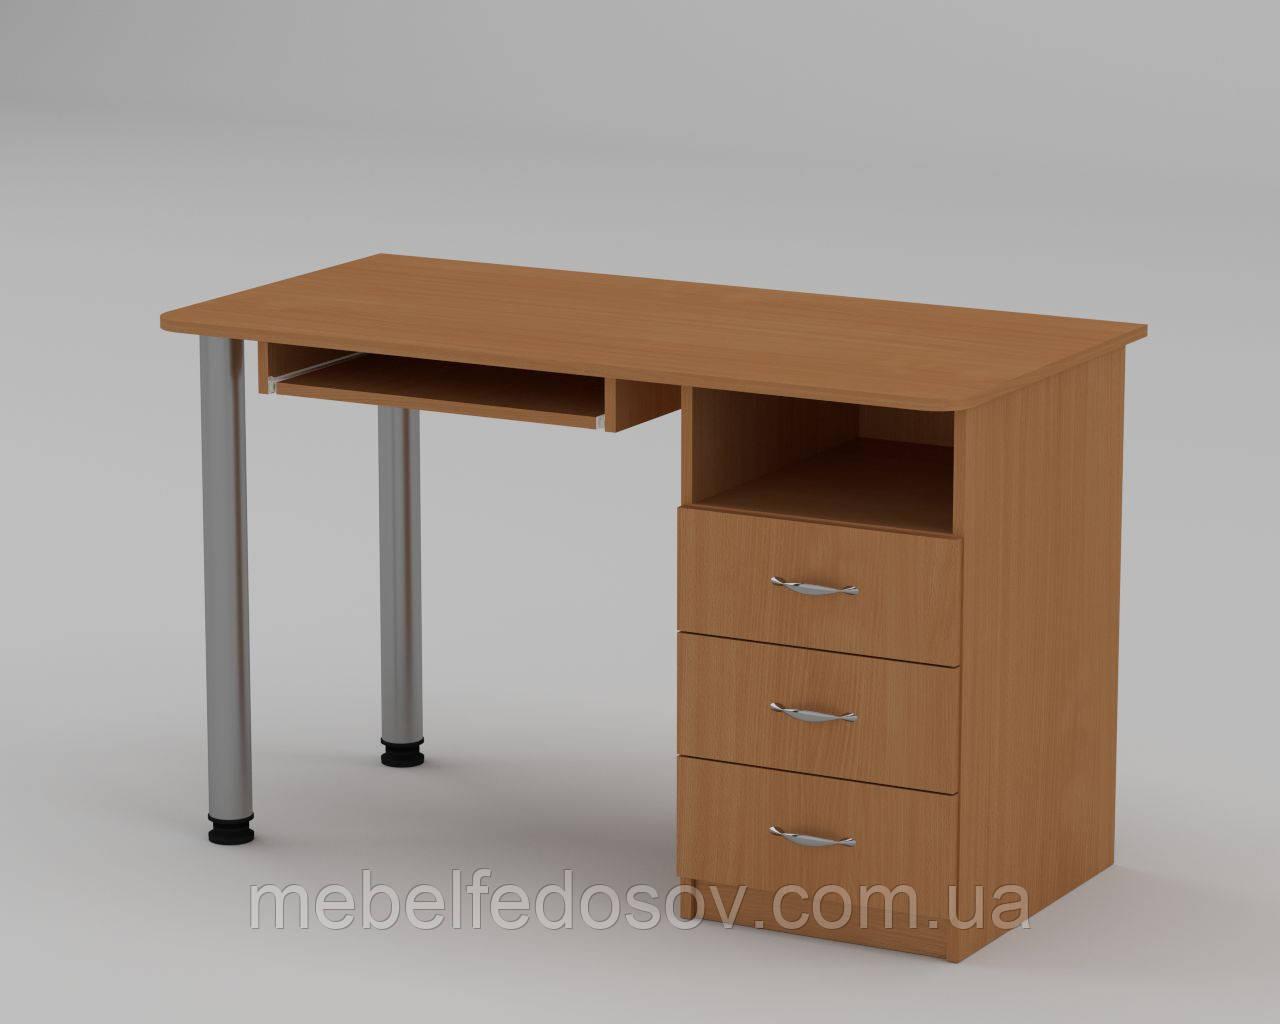 Стол компьютерный СКМ-9 (Компанит) 1200х600х736мм